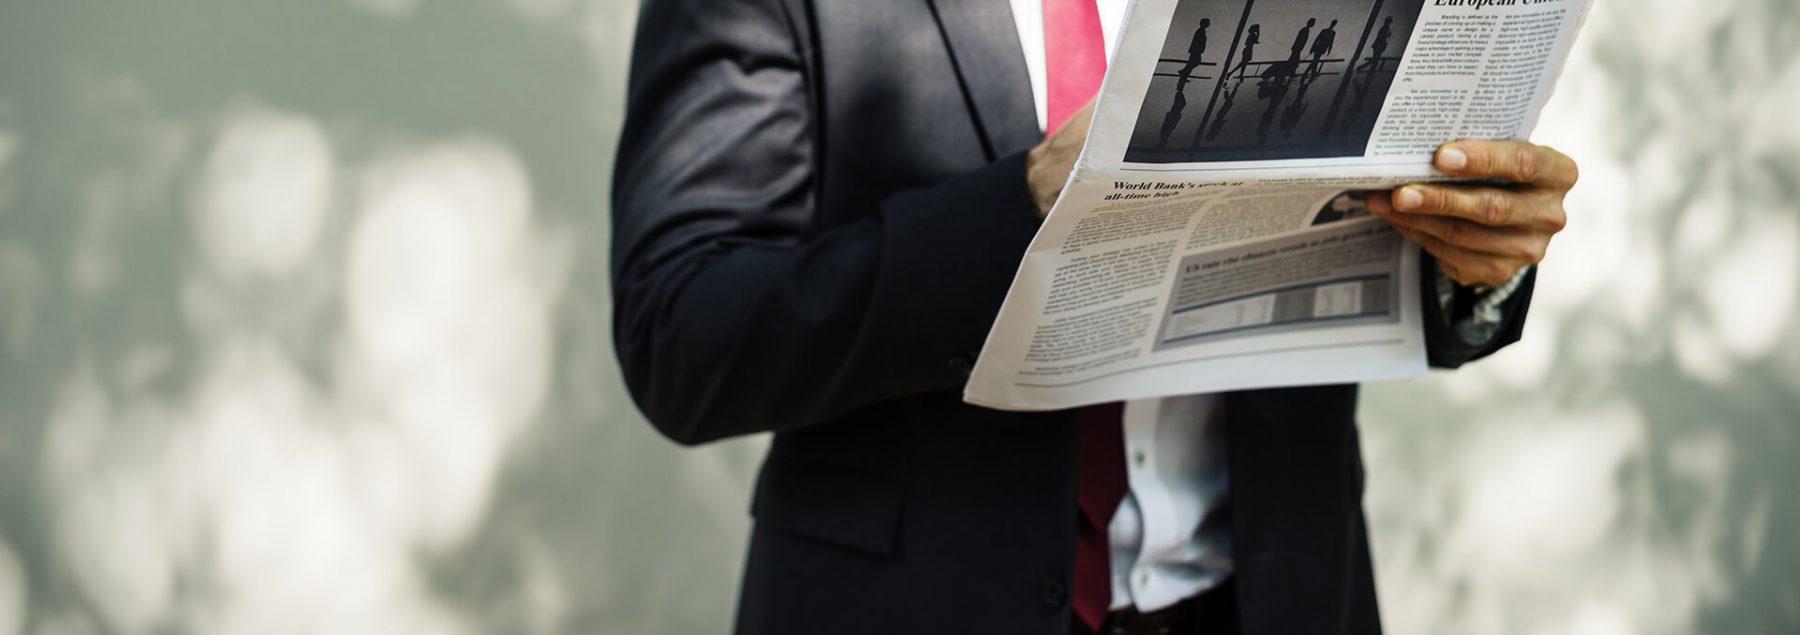 Man reading newspaper // Photo credit: rawpixel unsplash